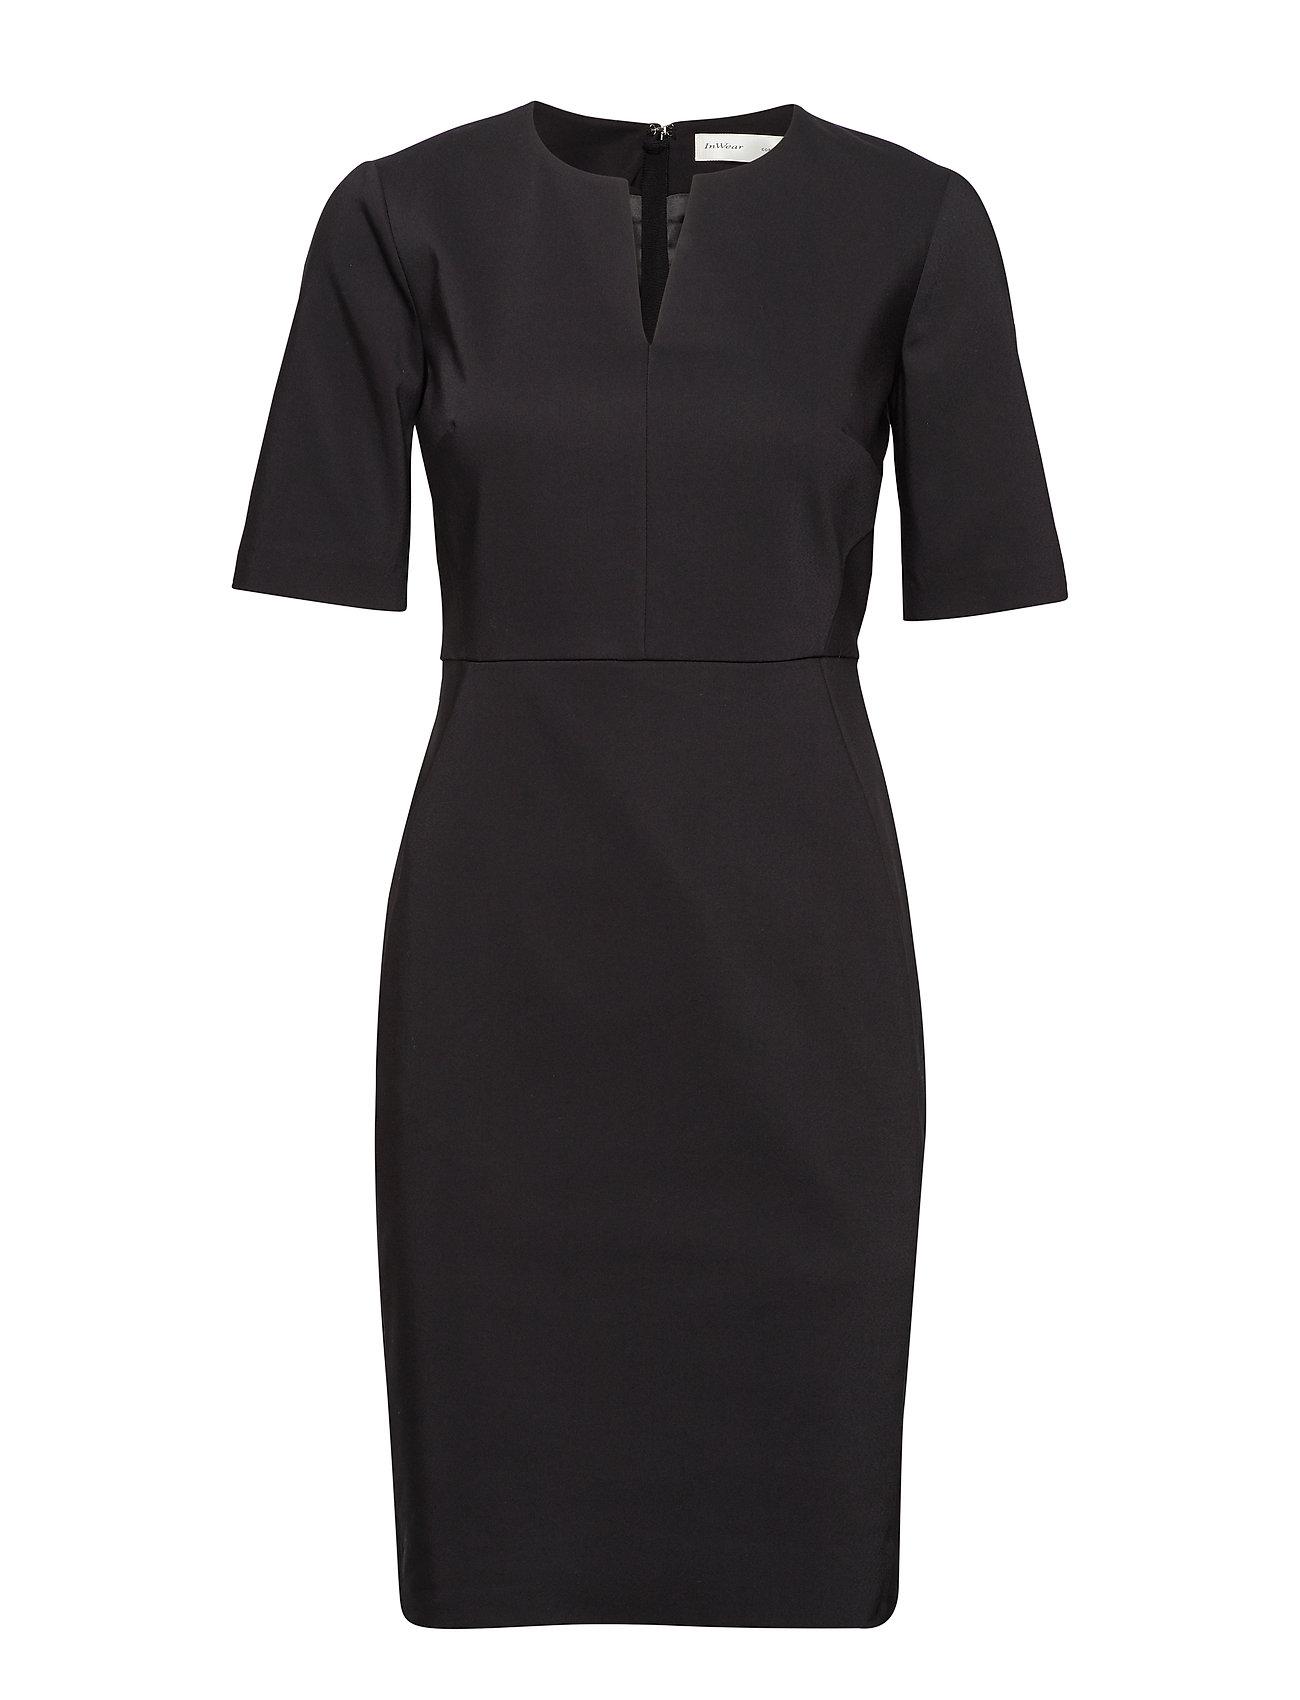 3babe54f68bd Zella Dress (Black) (900 kr) - InWear -